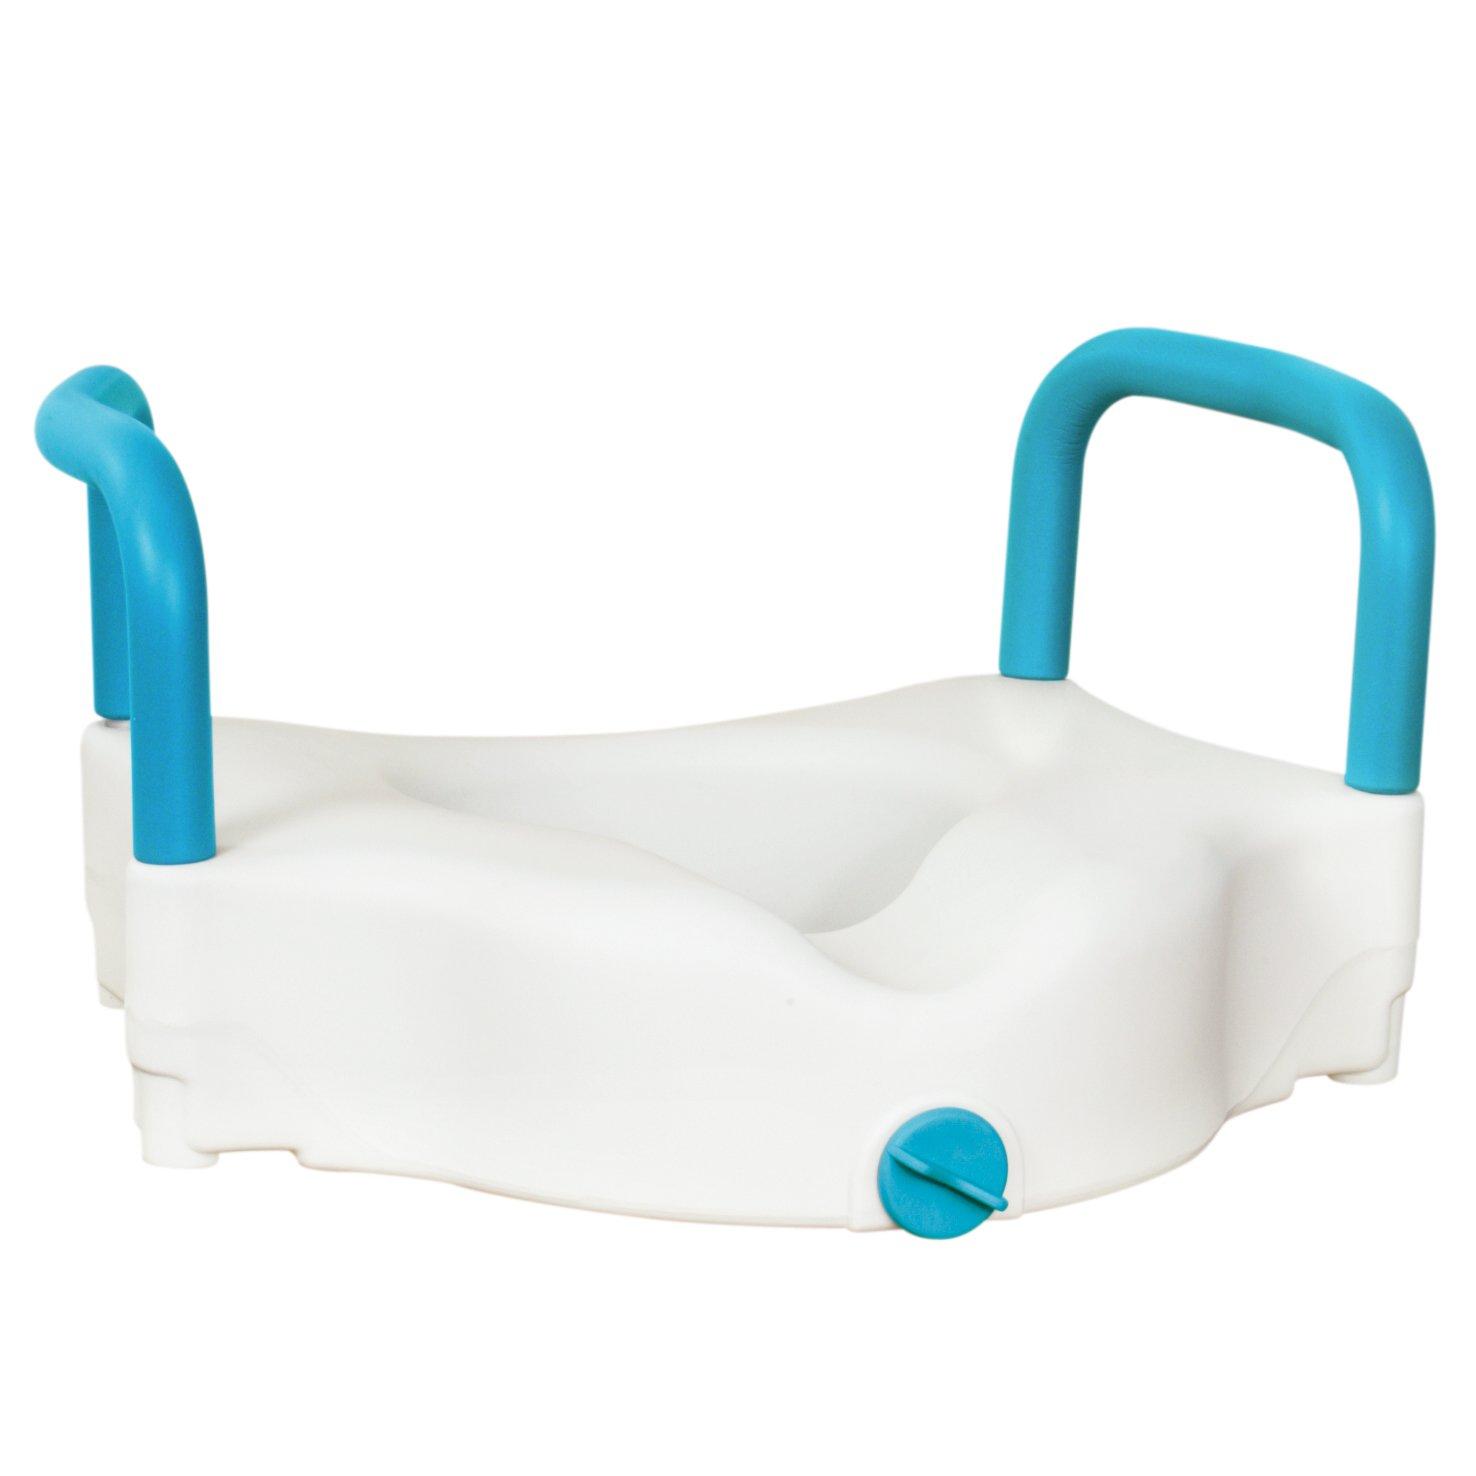 AquaSense 3 in 1 Raised Toilet Seat Amazon Health & Personal Care